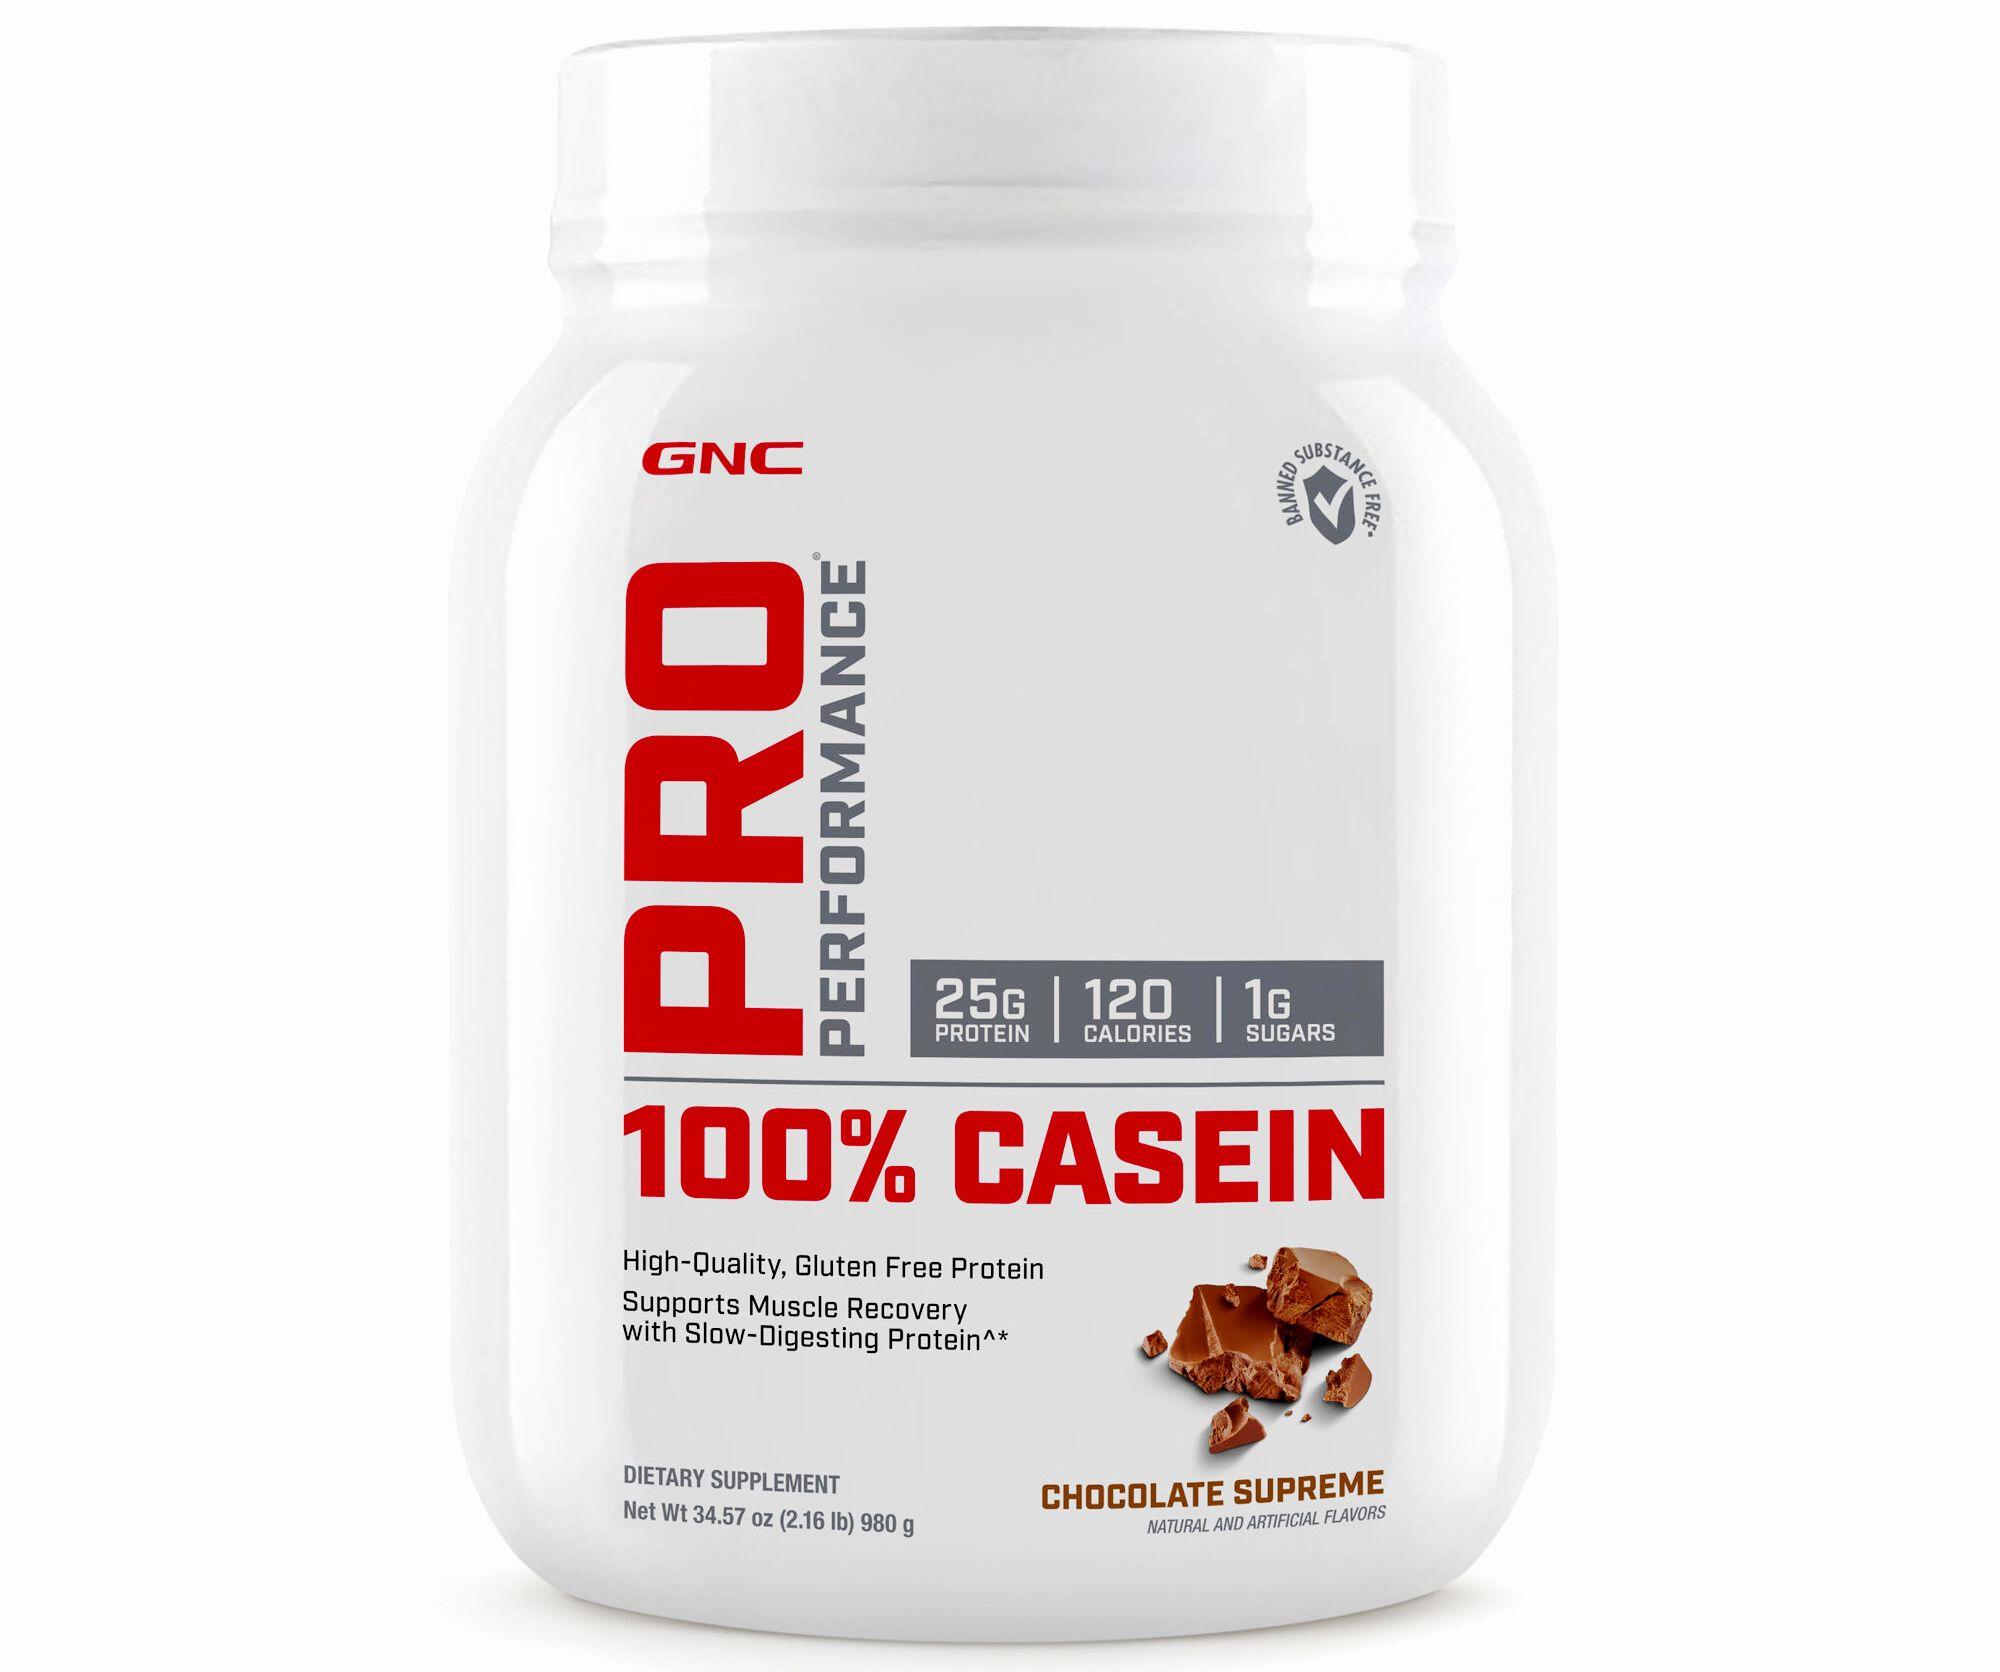 GNC 100% Casein